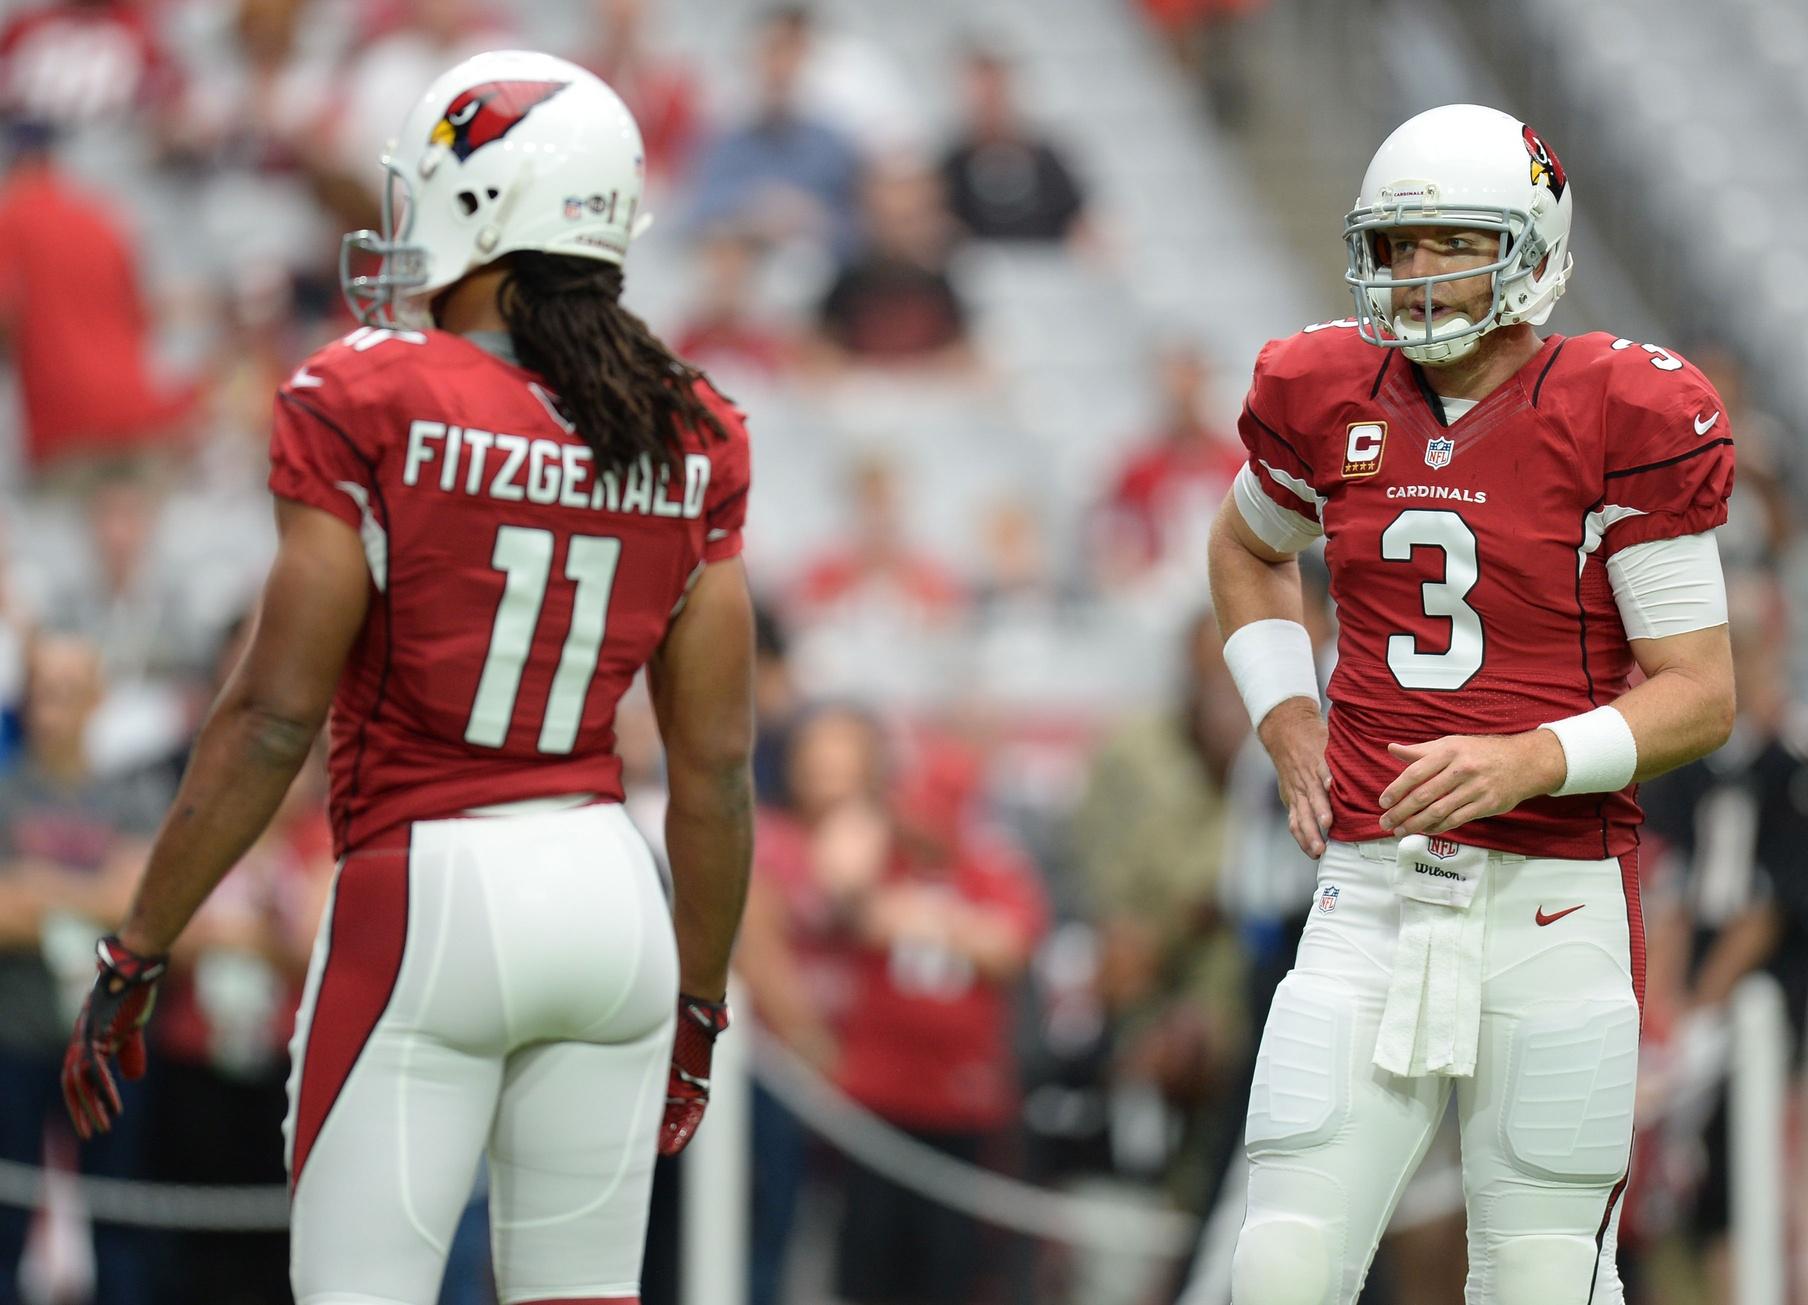 Cardinals receiver Larry Fitzgerald and quarterback Carson Palmer